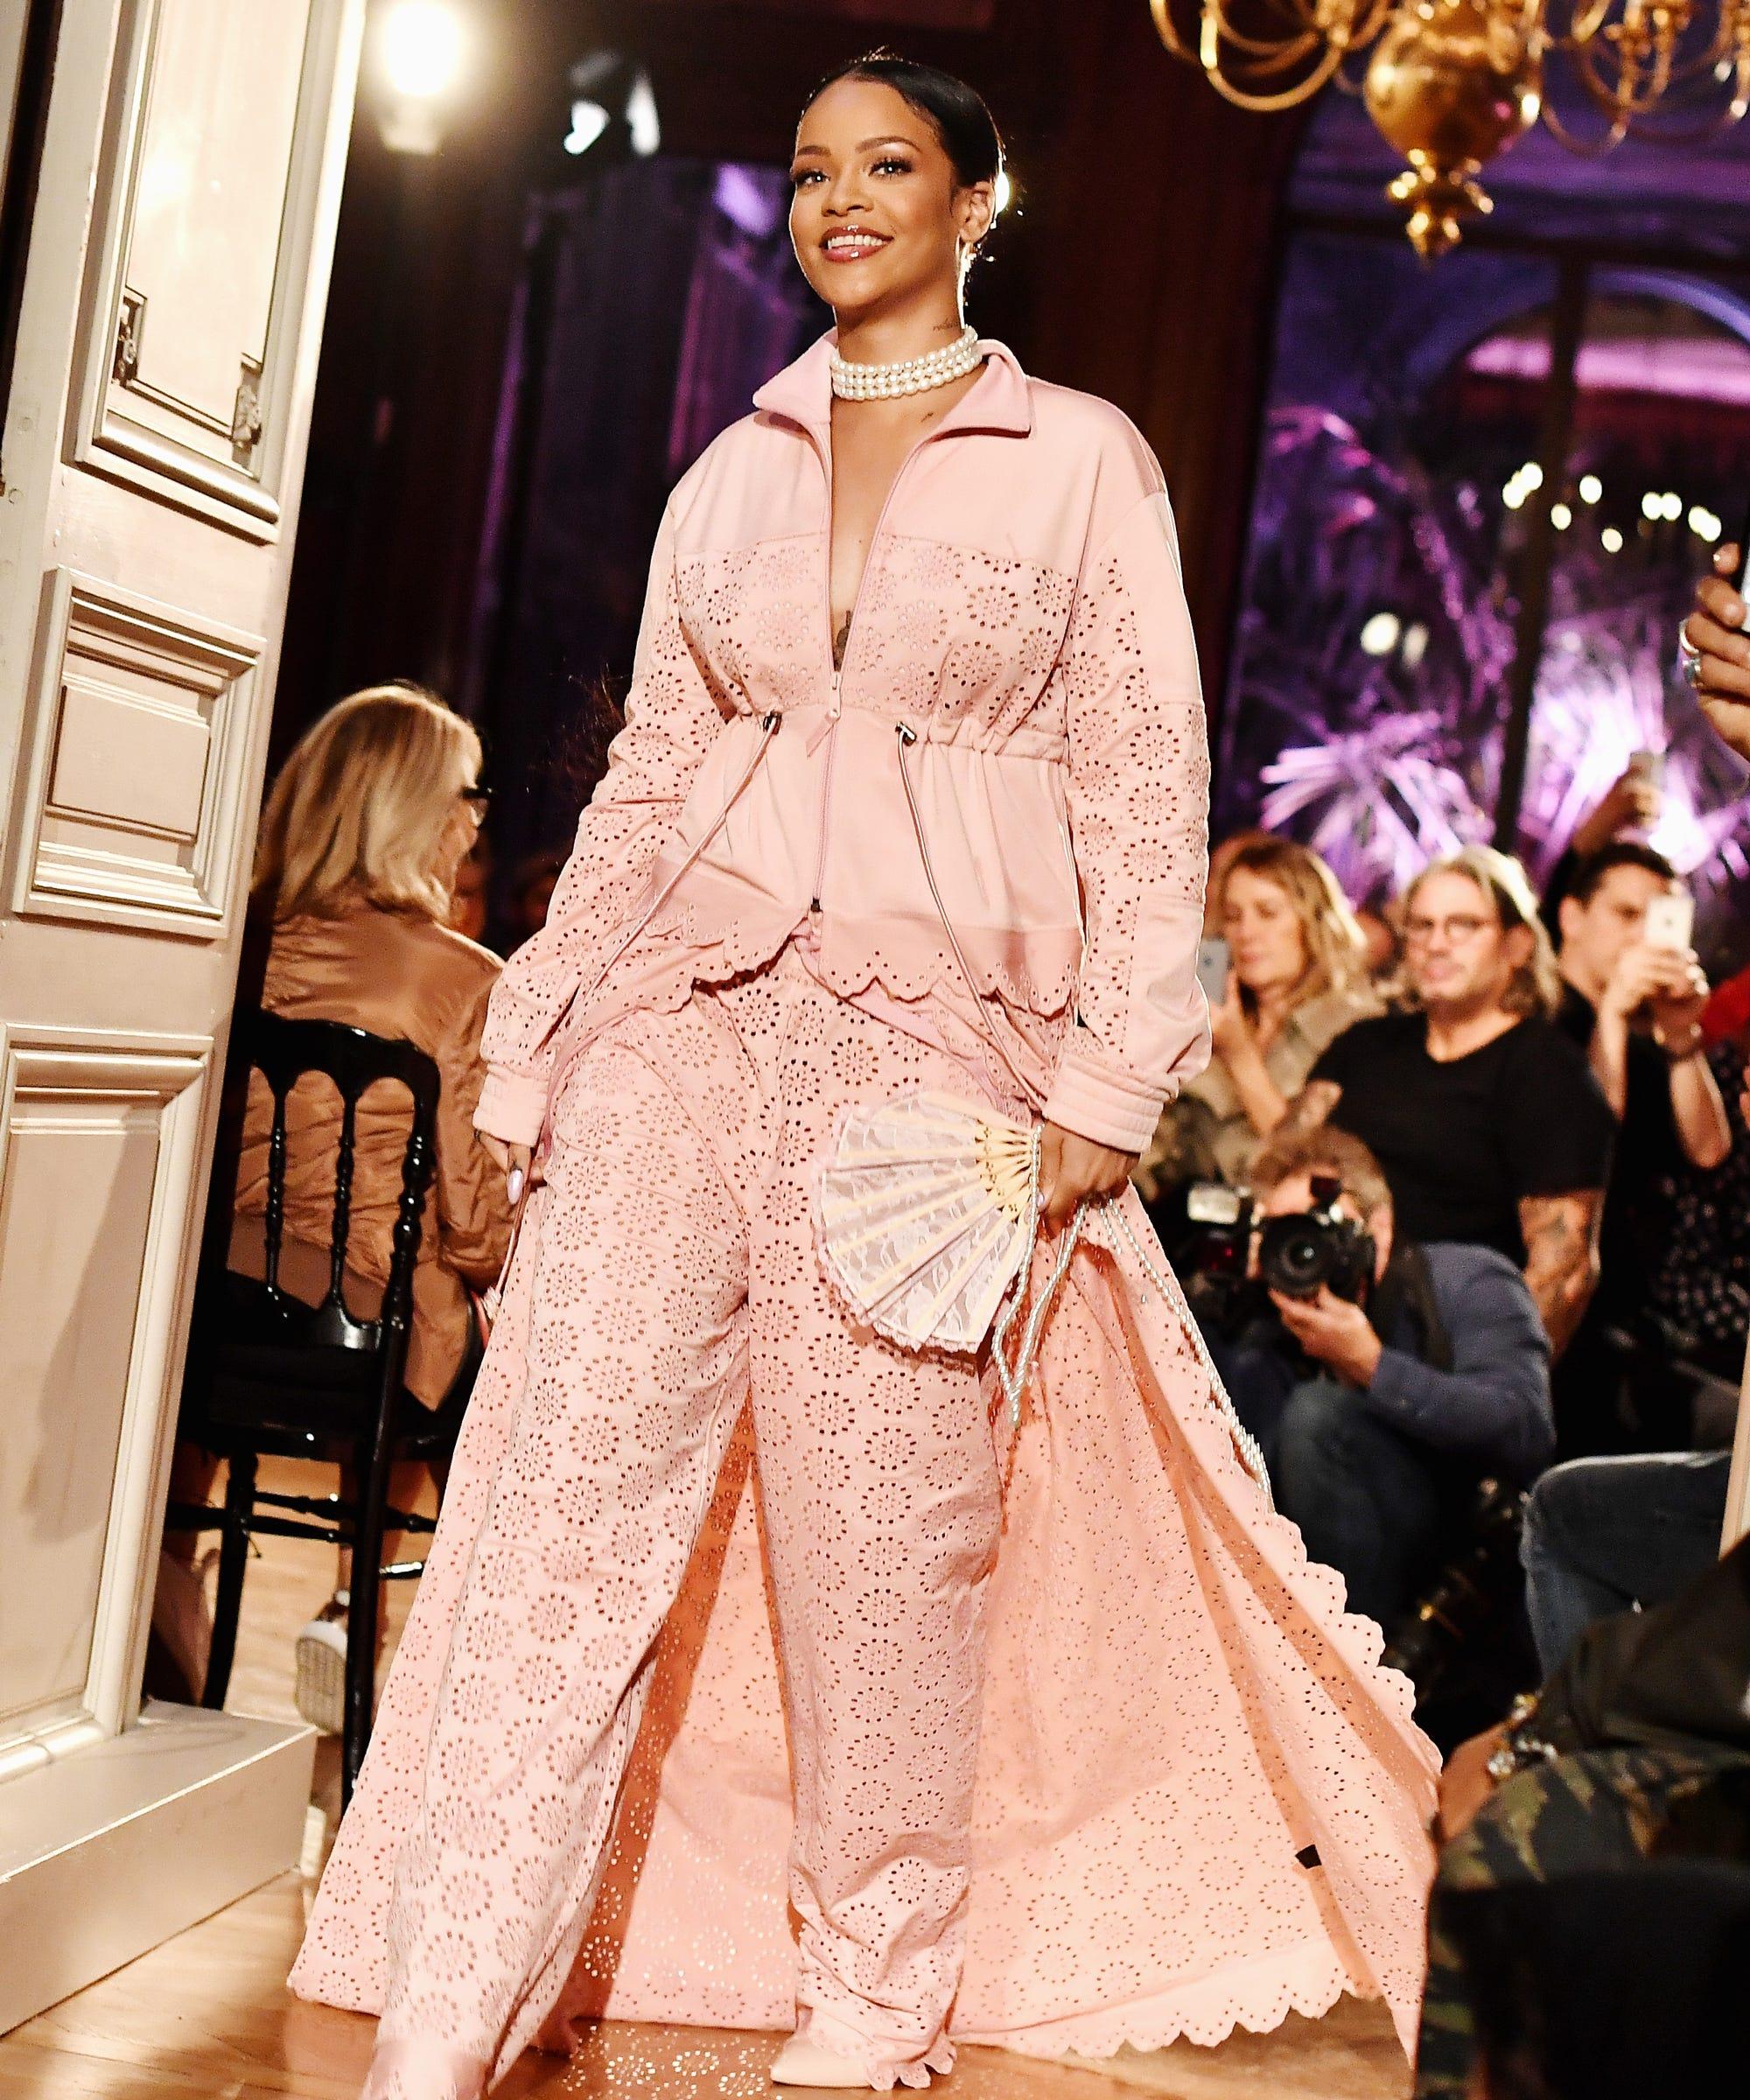 7c7c4cc7c4e2 2016 Best Fashion Moments - Rihanna Bill Cunningham